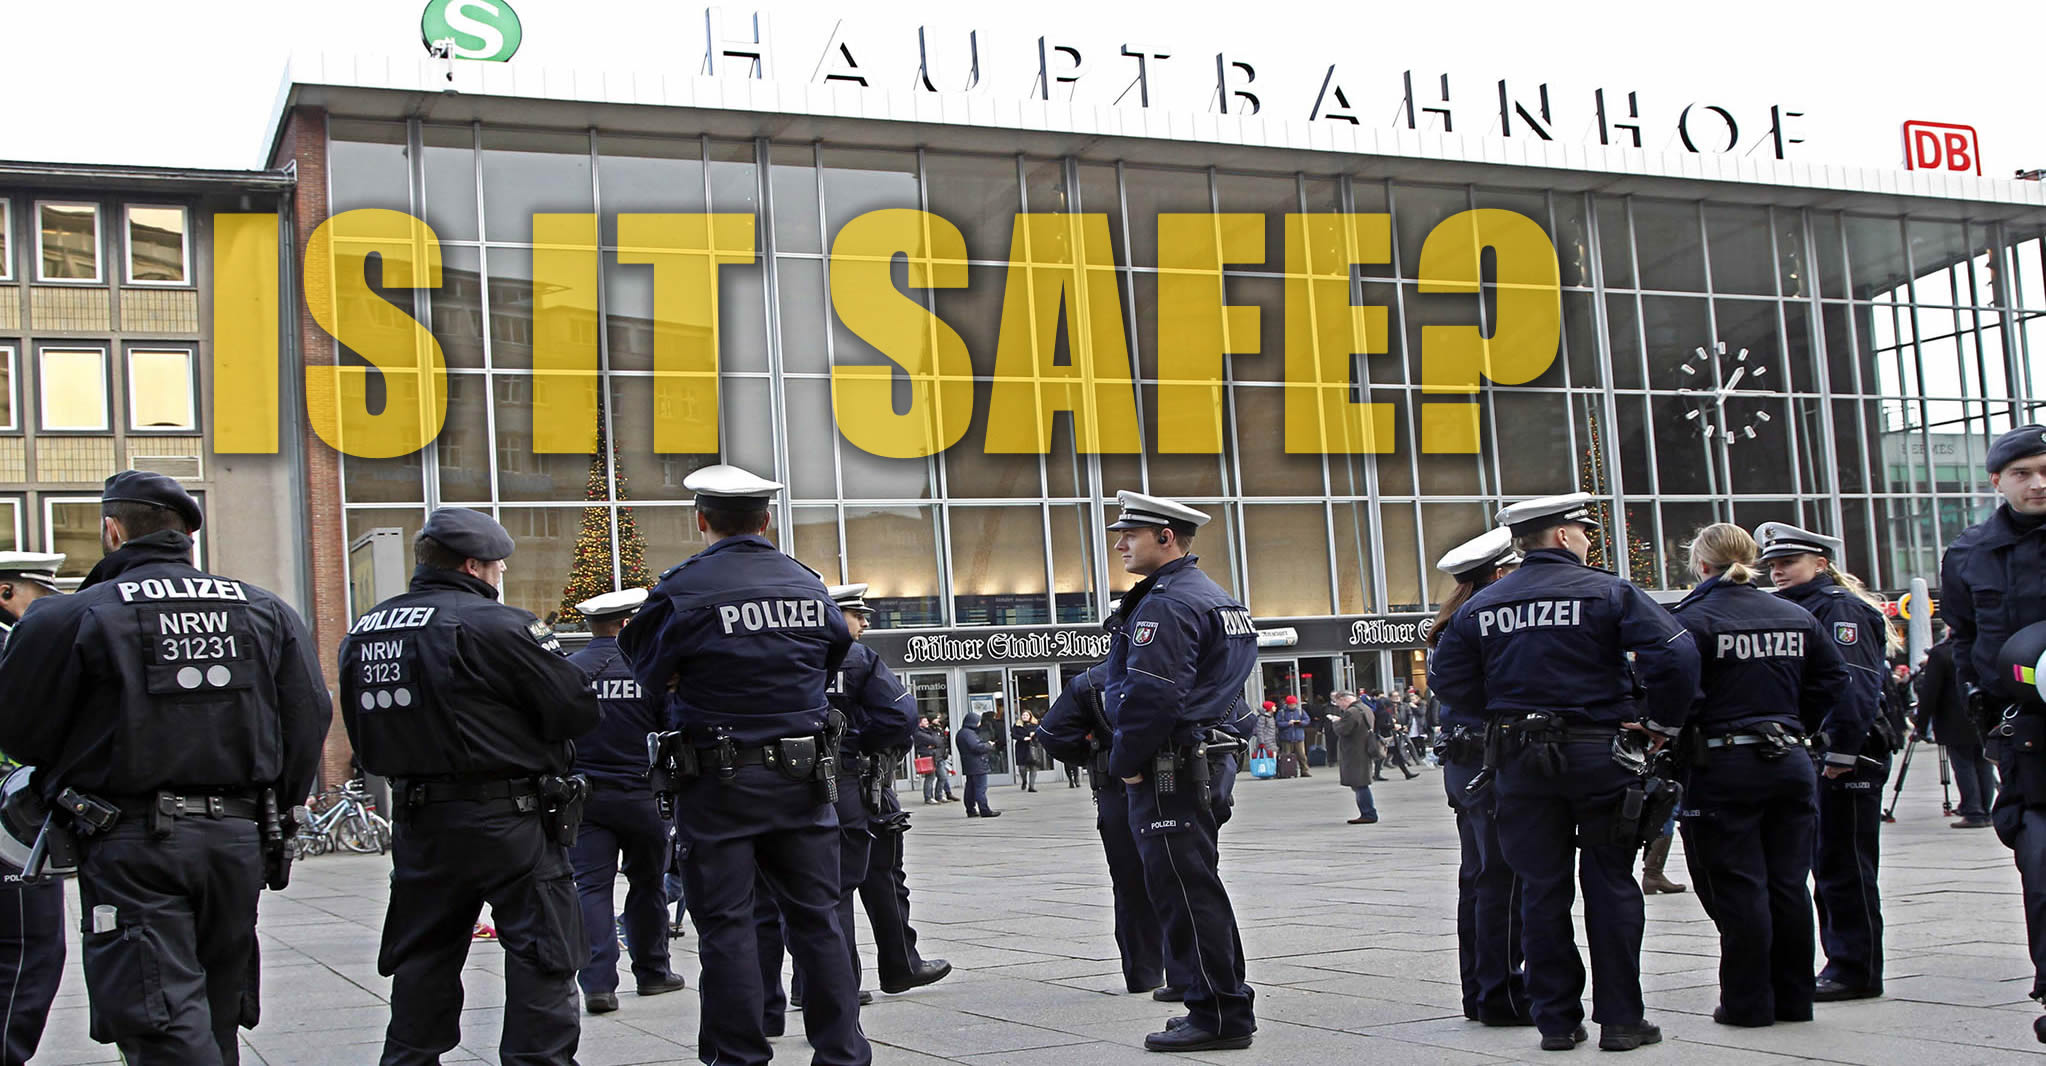 is it safe in germany